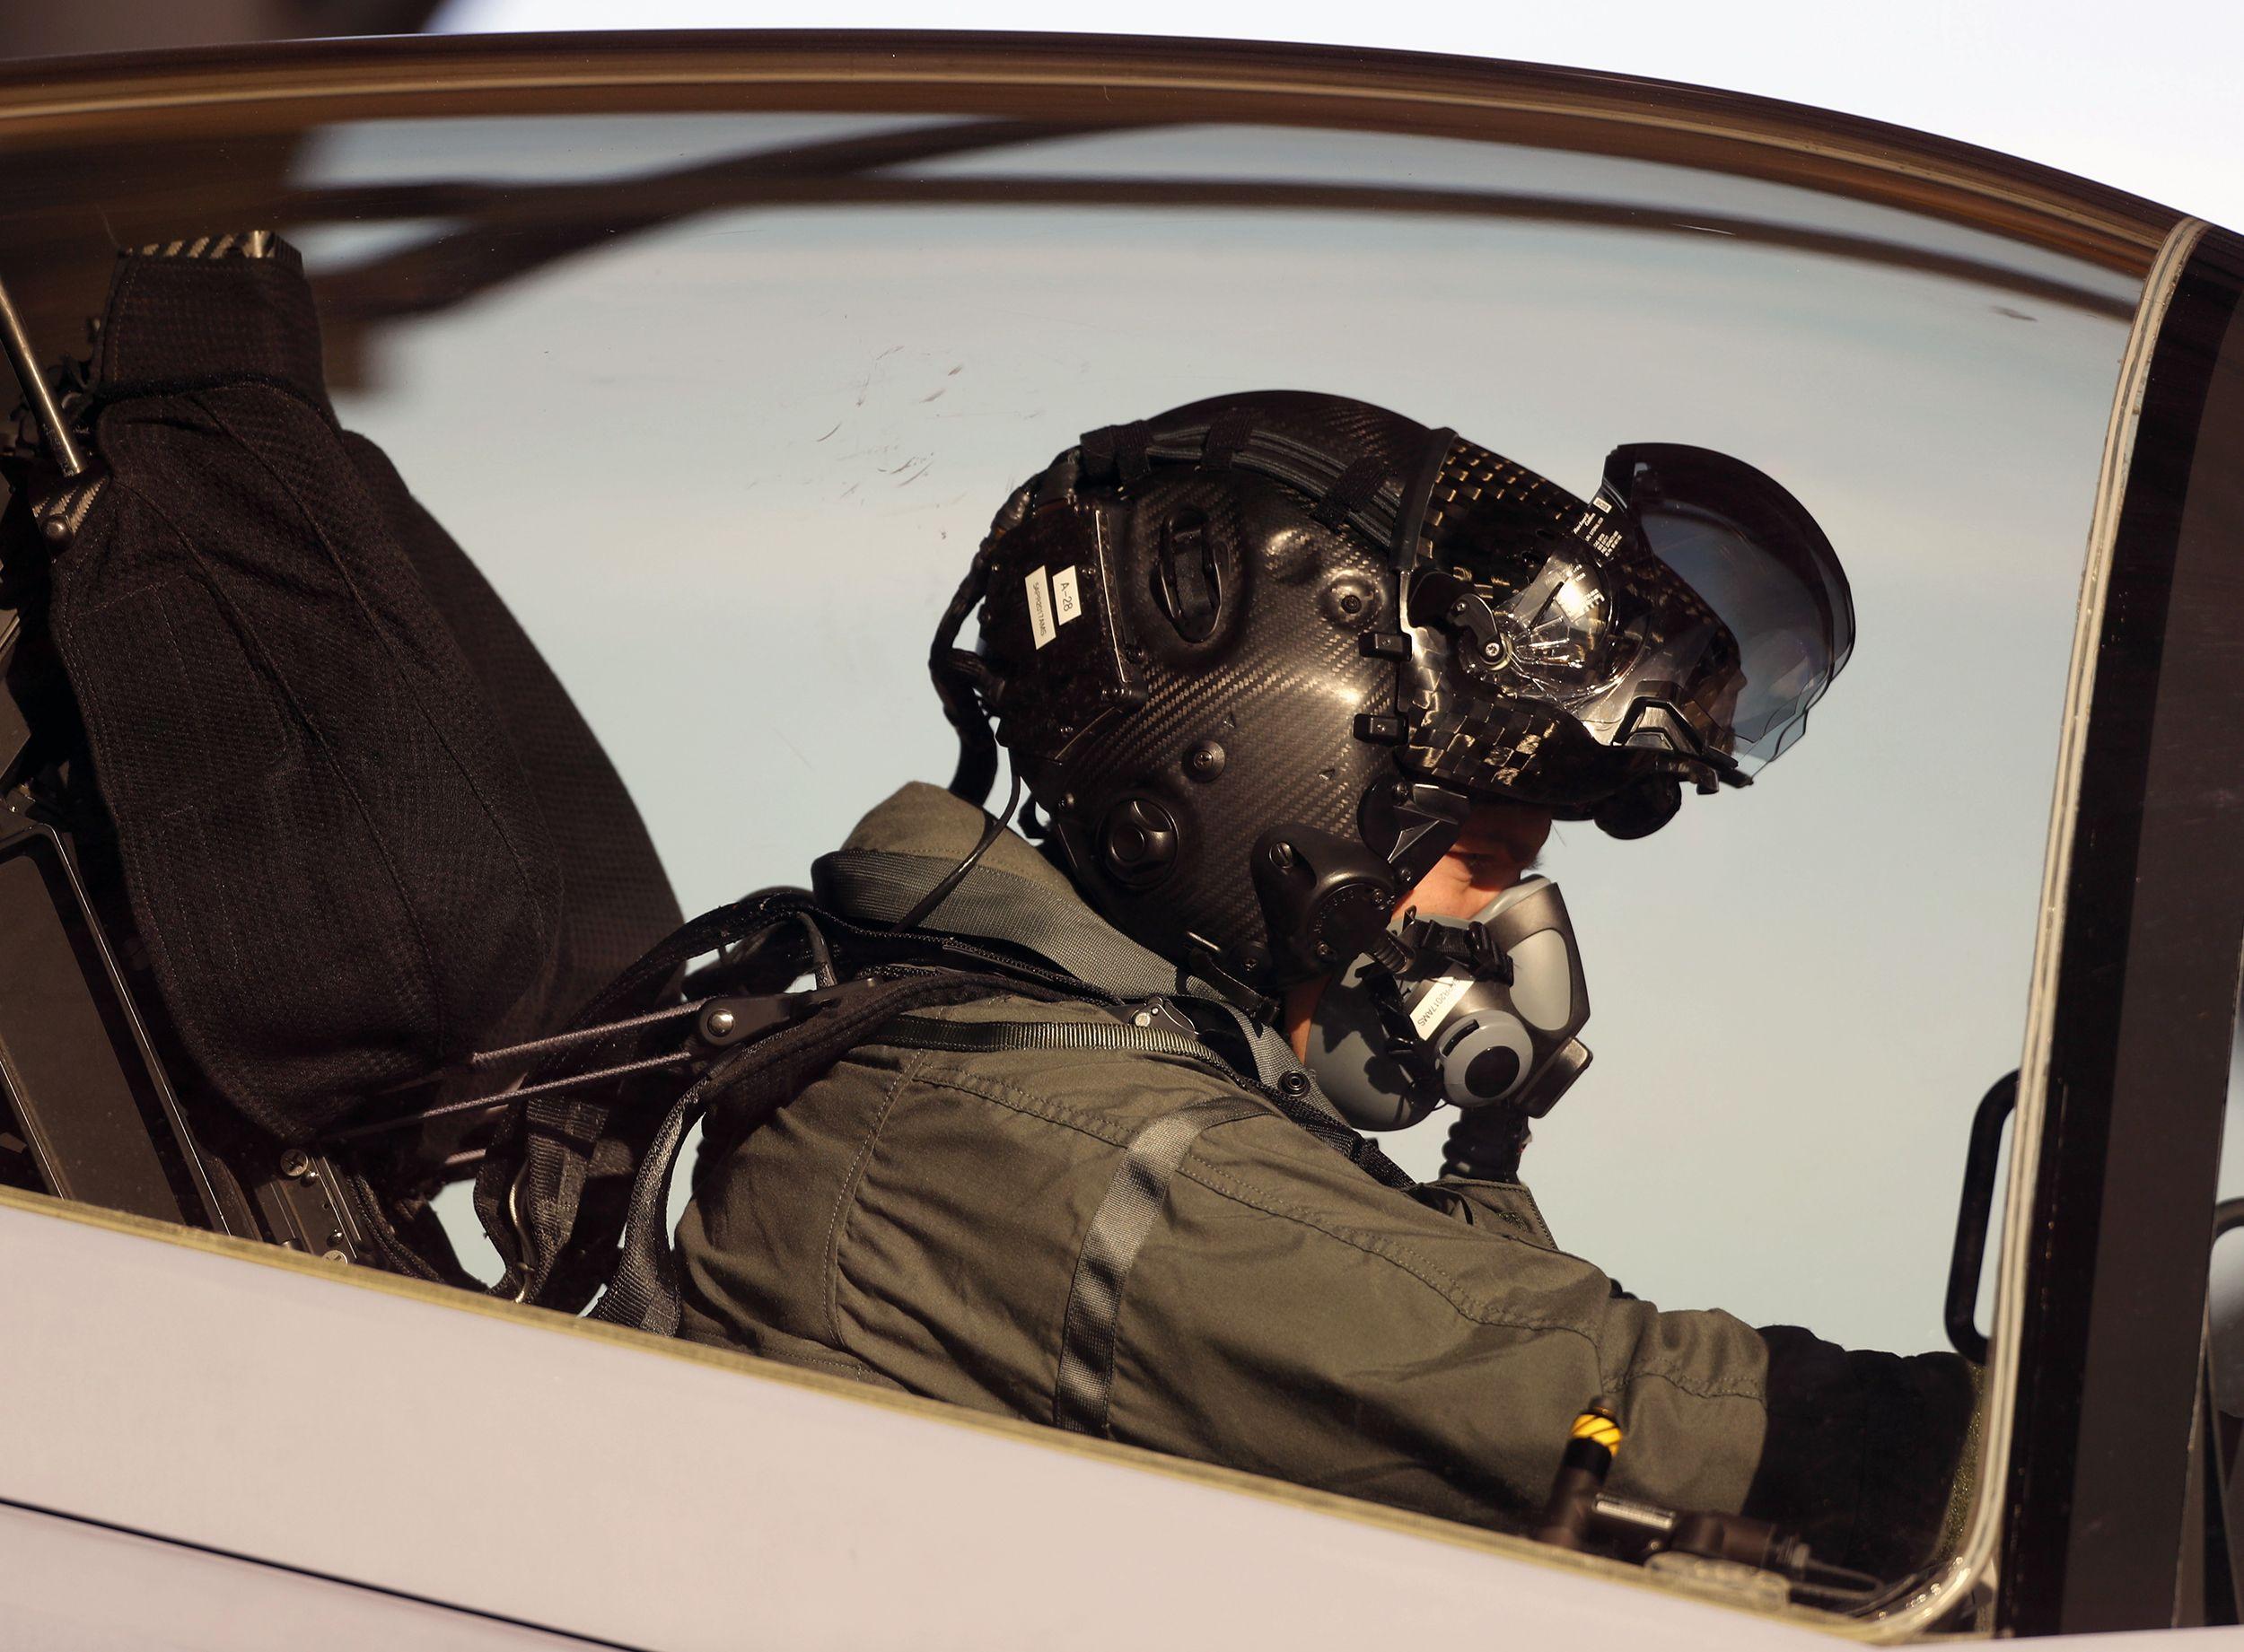 Are Cockpit Electromagnetic Fields Killing Pilots?